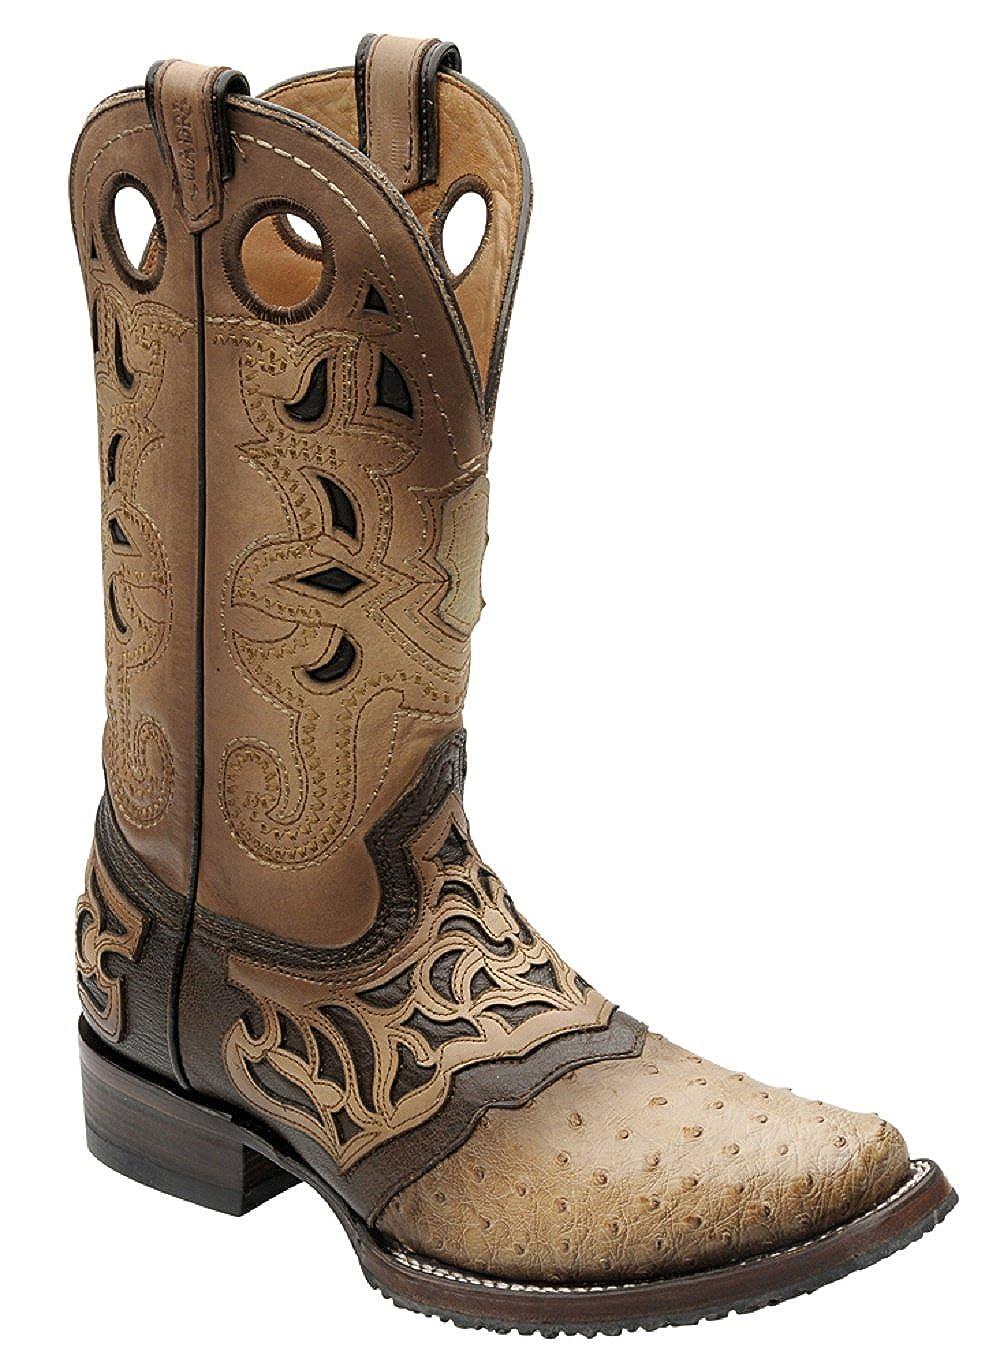 a62a7cc30e0 Amazon.com | Cuadra Ostrich Rodeo Western Boots 2I03A1 | Western